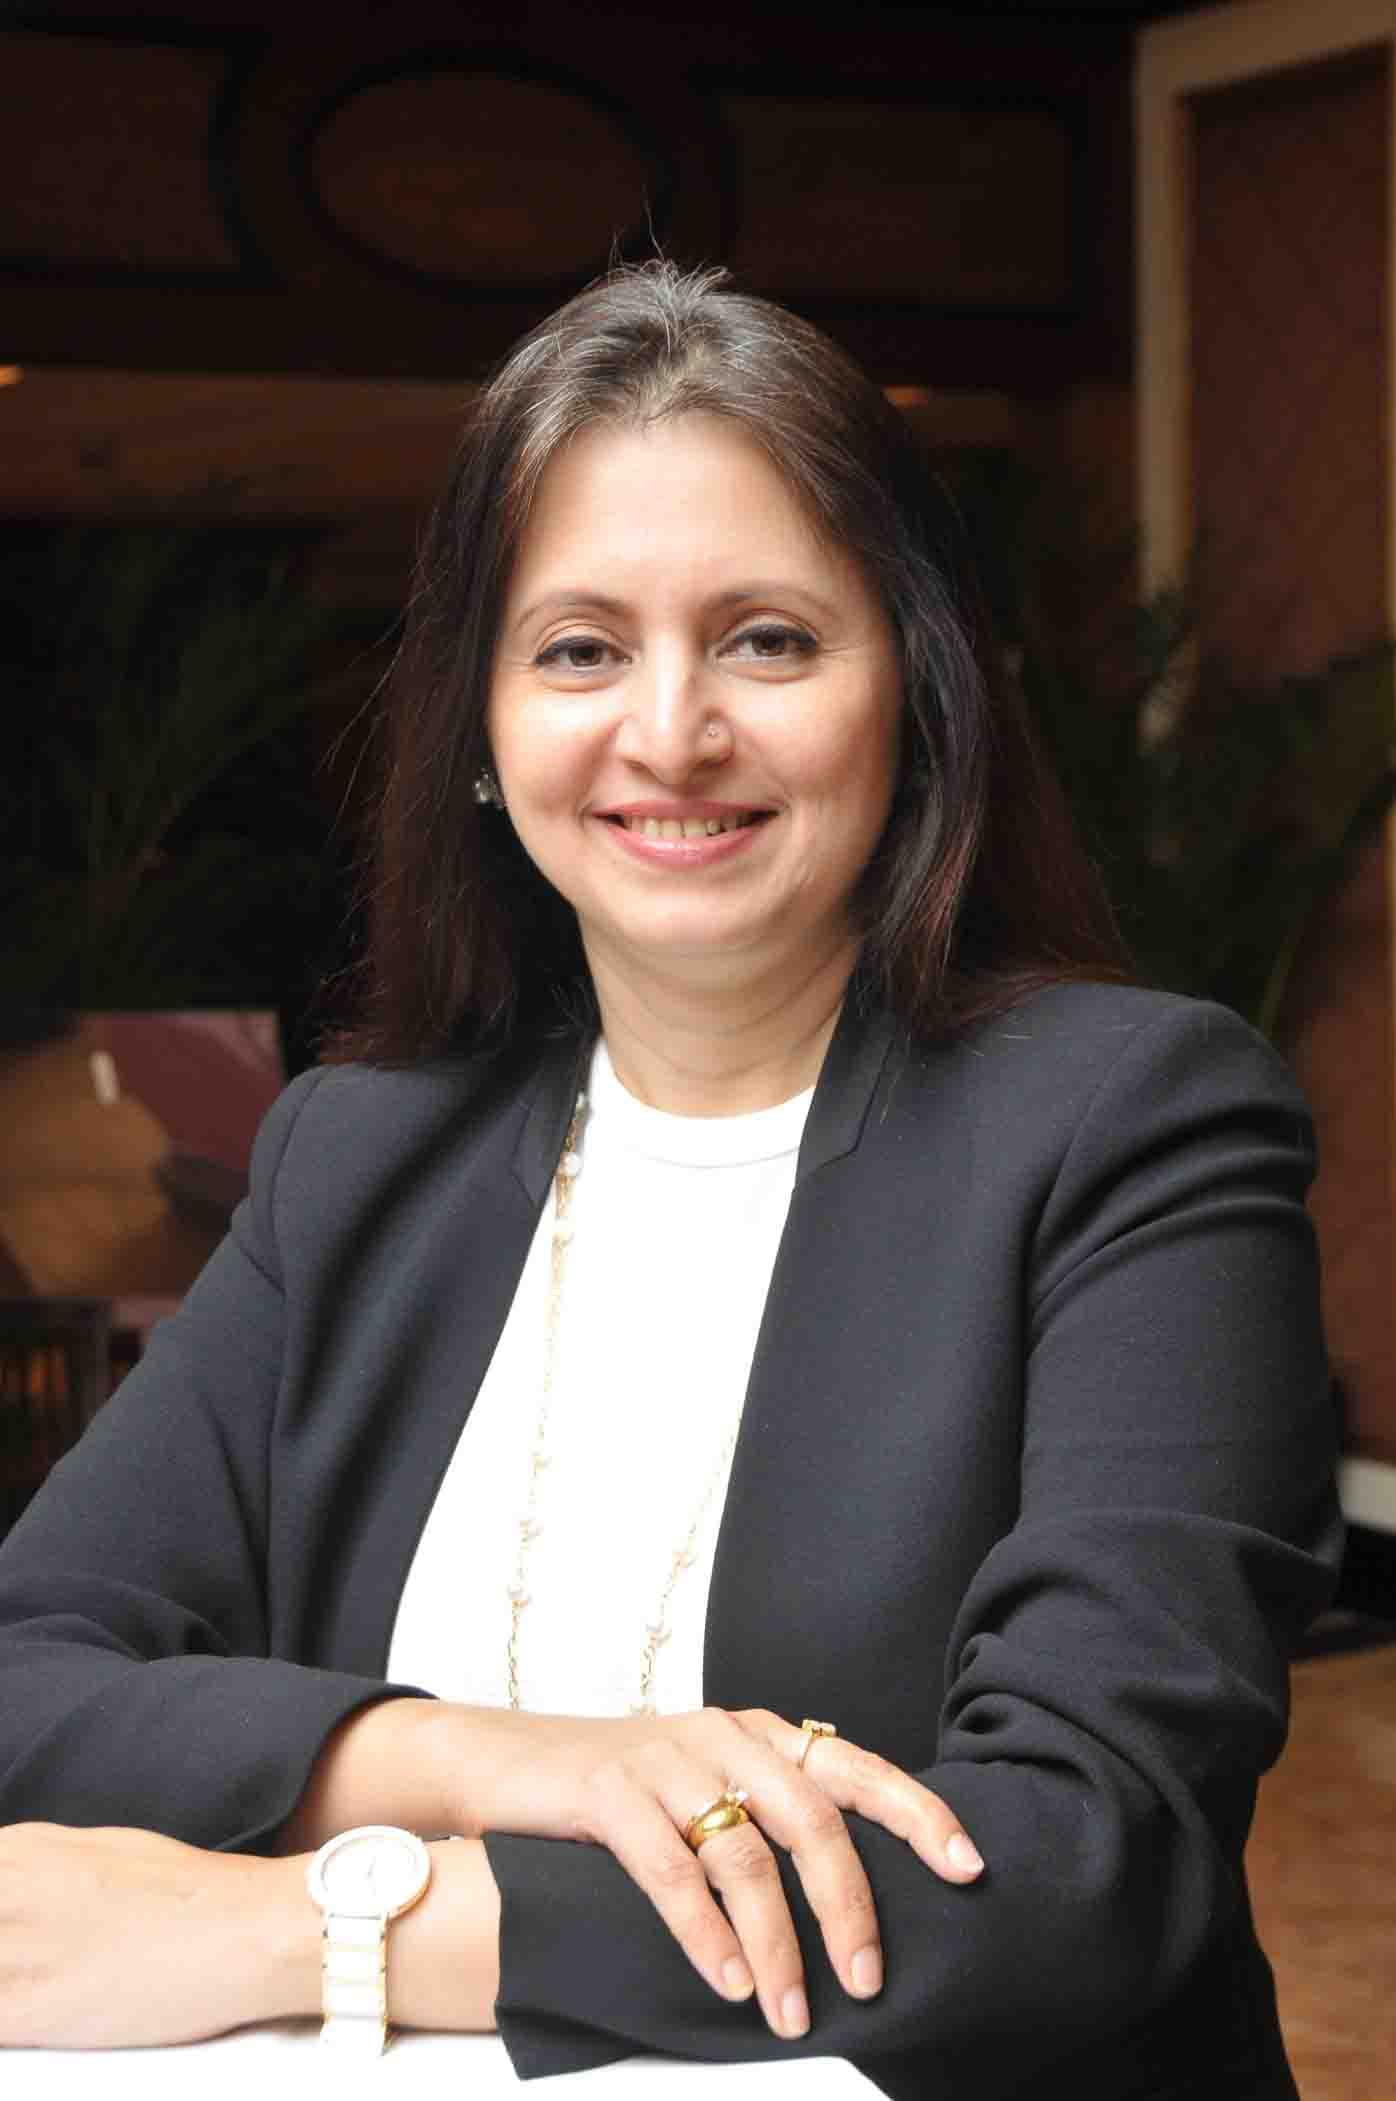 Shweta Purandare, ASCI Secretary-General